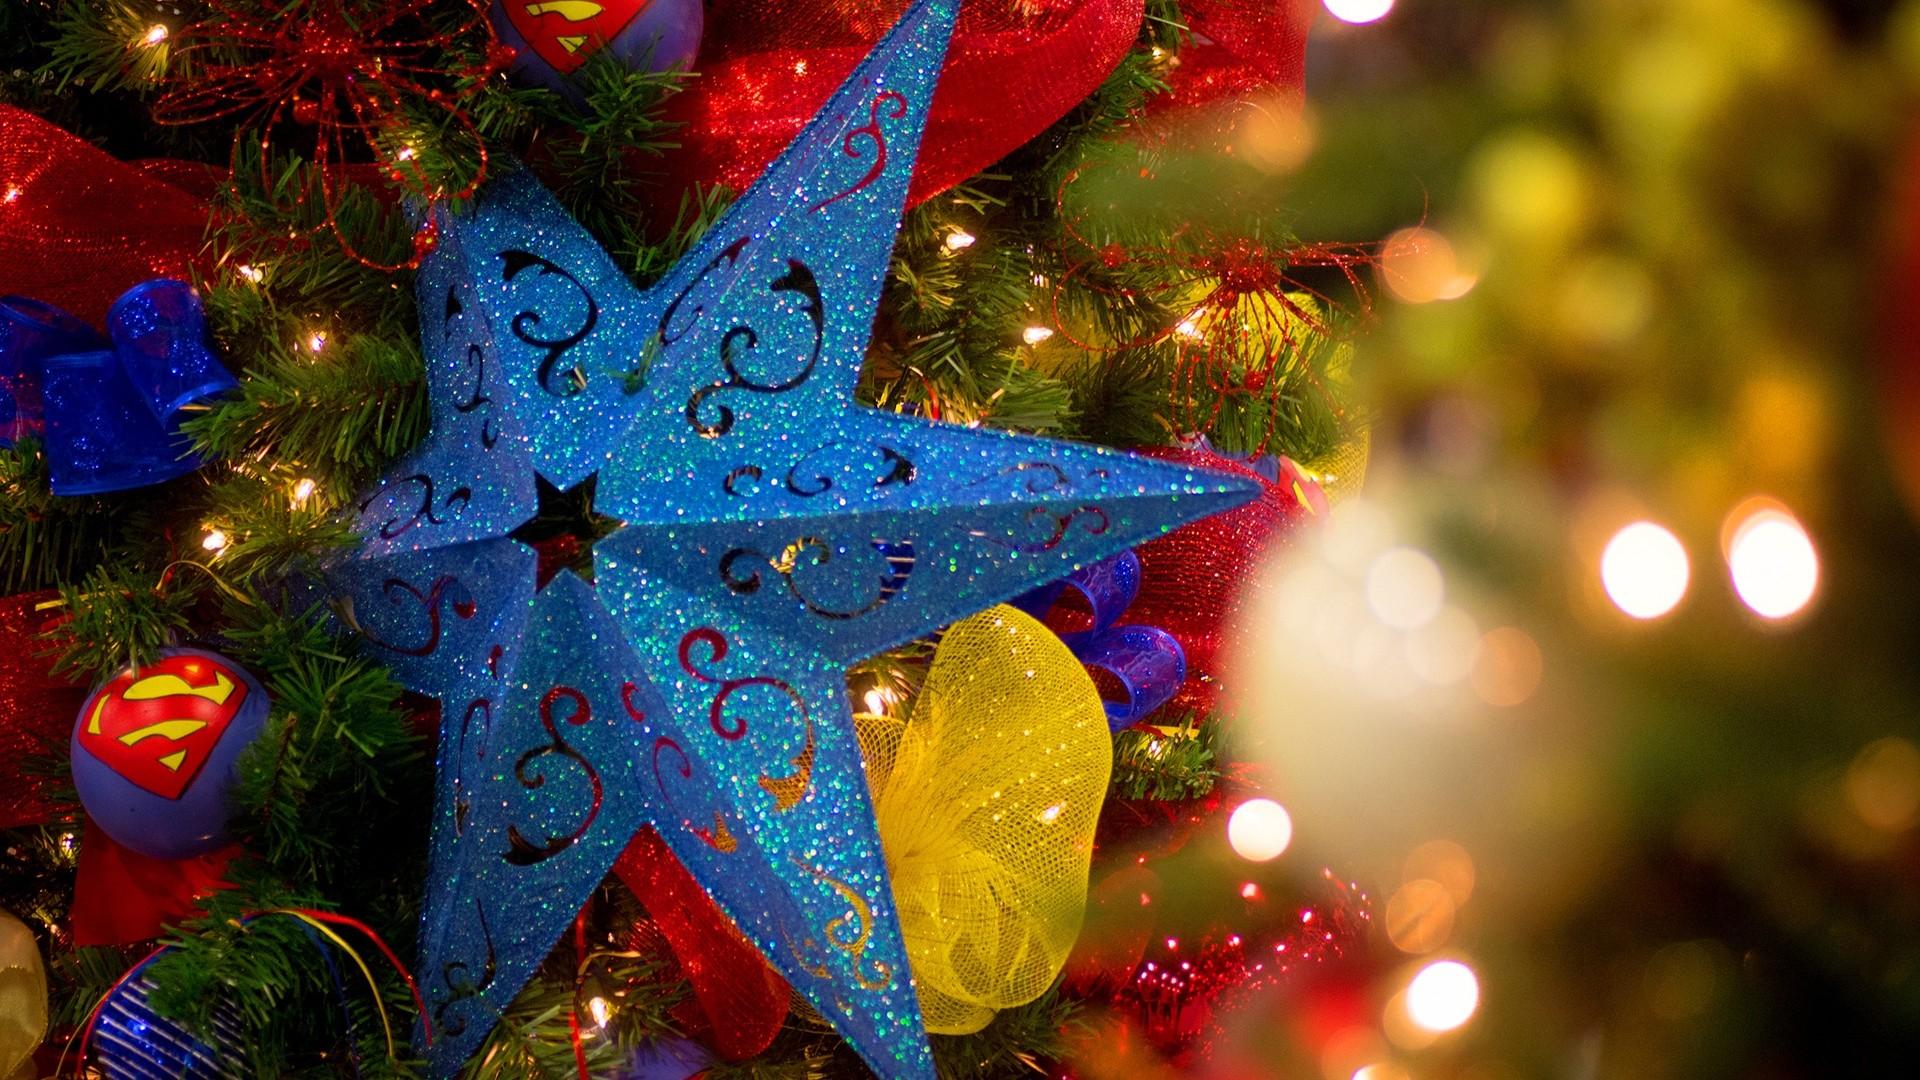 Christmas Star HD Wallpaper